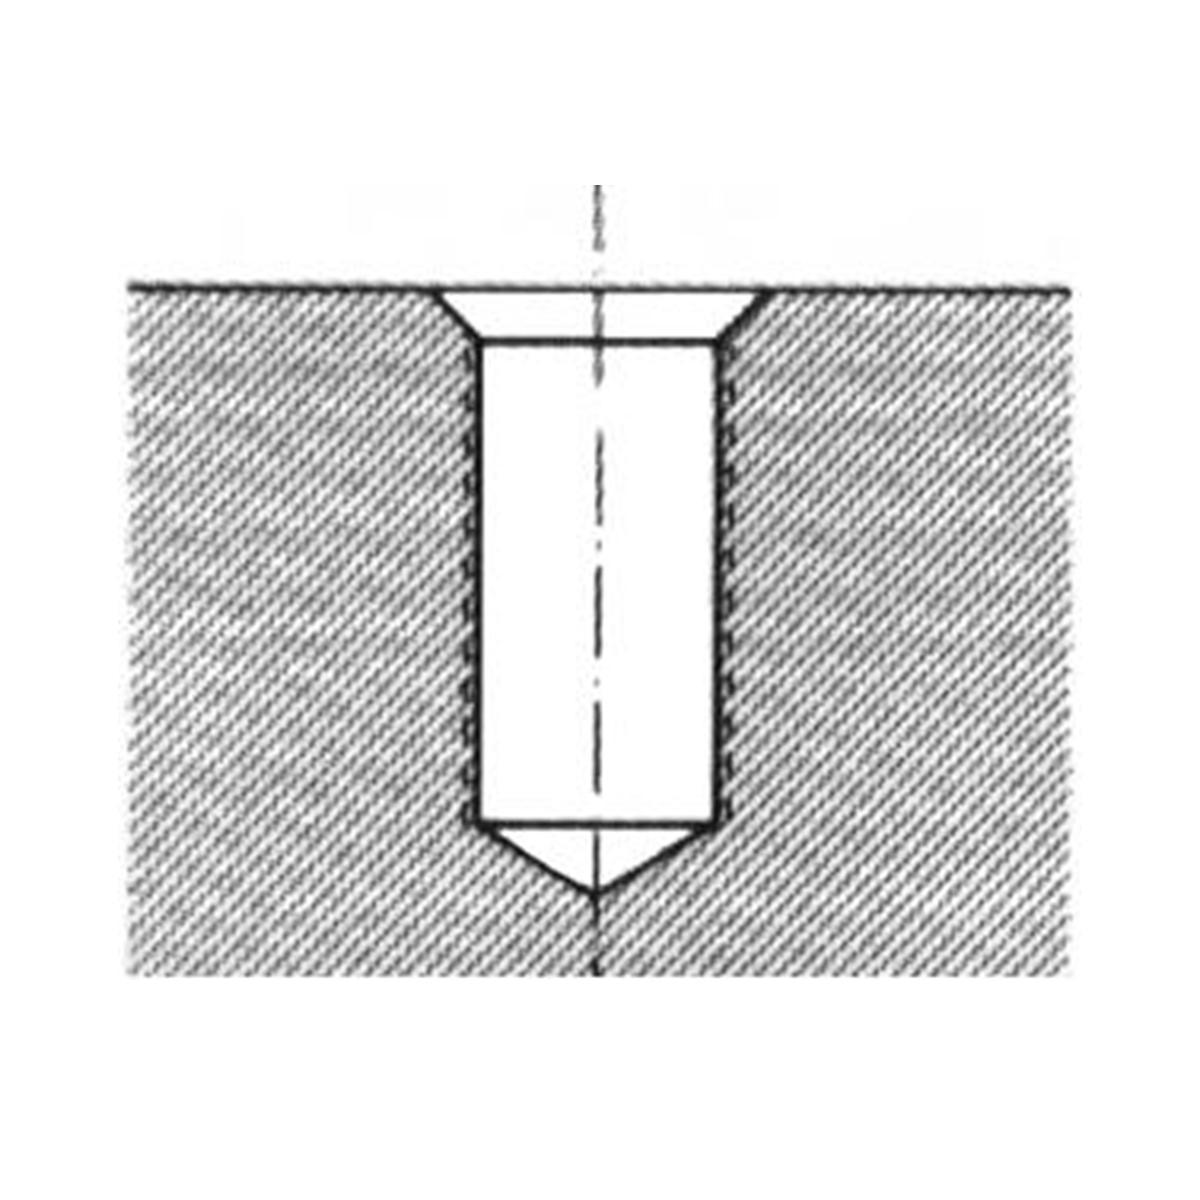 foret a percer 2 etages pour alu pvc forets acier au cobalt 5 acier au cobalt 5 code. Black Bedroom Furniture Sets. Home Design Ideas